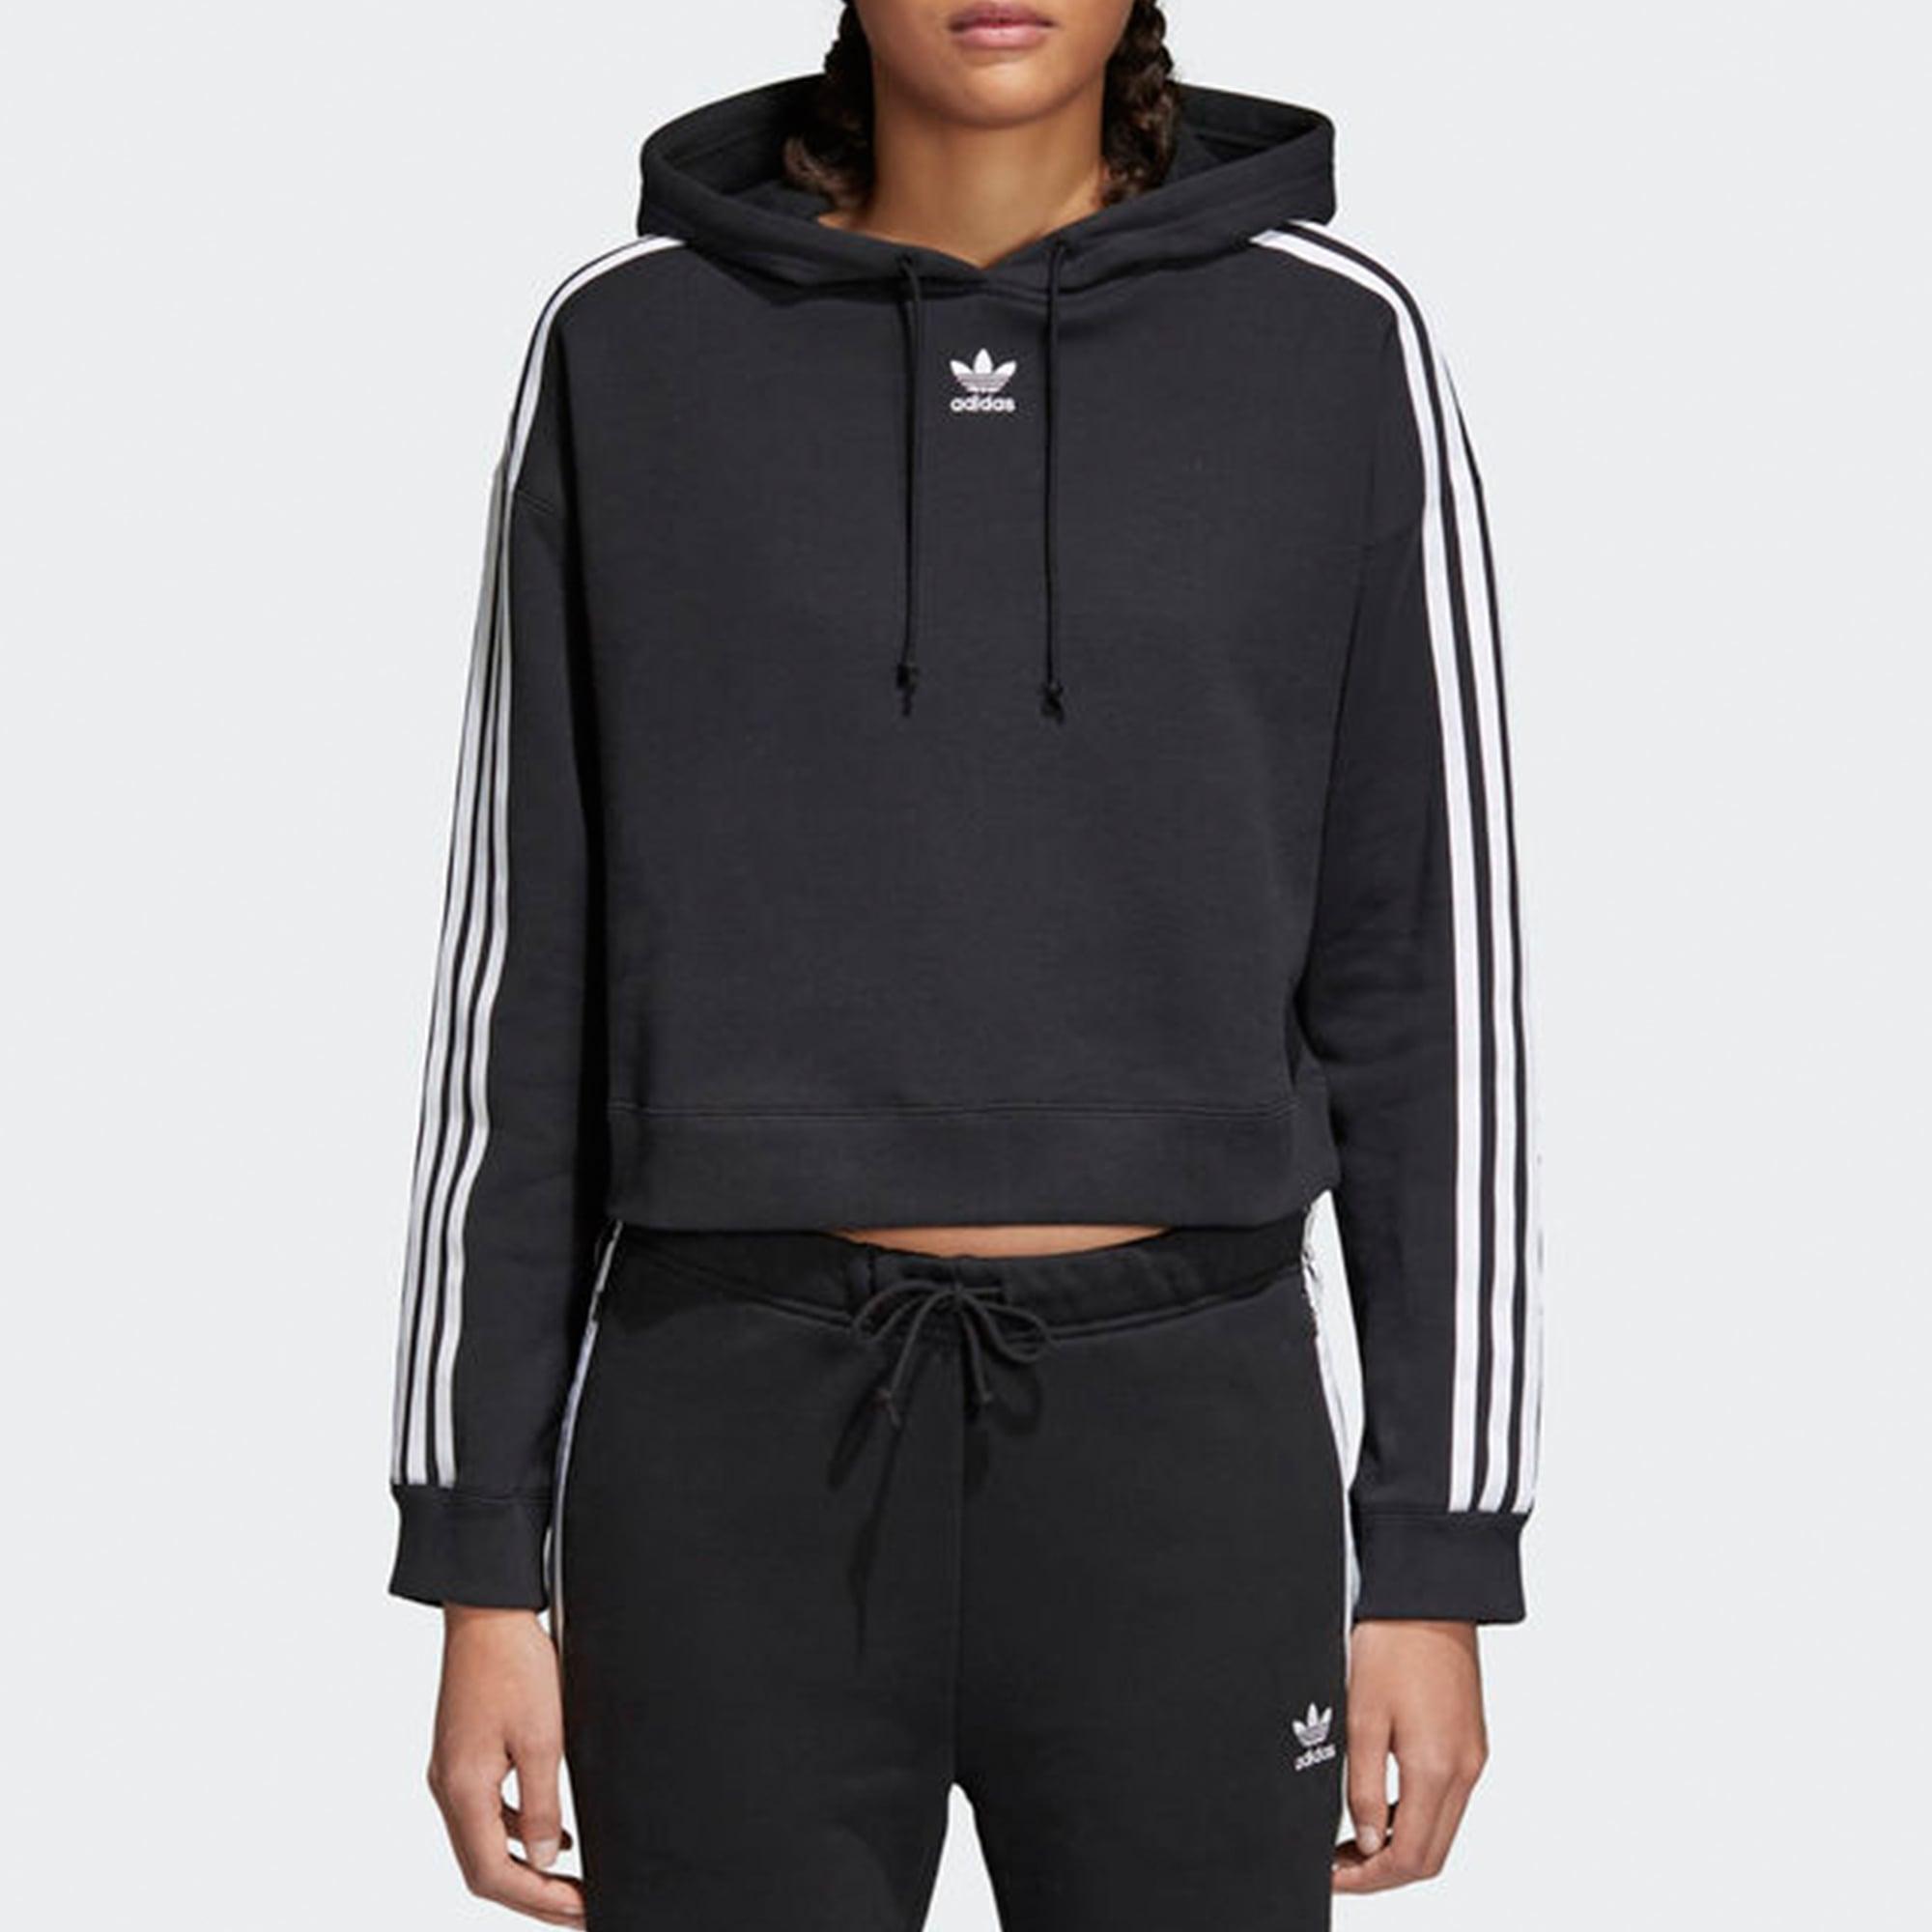 4c70757cc6b0c Adidas Originals Womens Cropped Hoodie